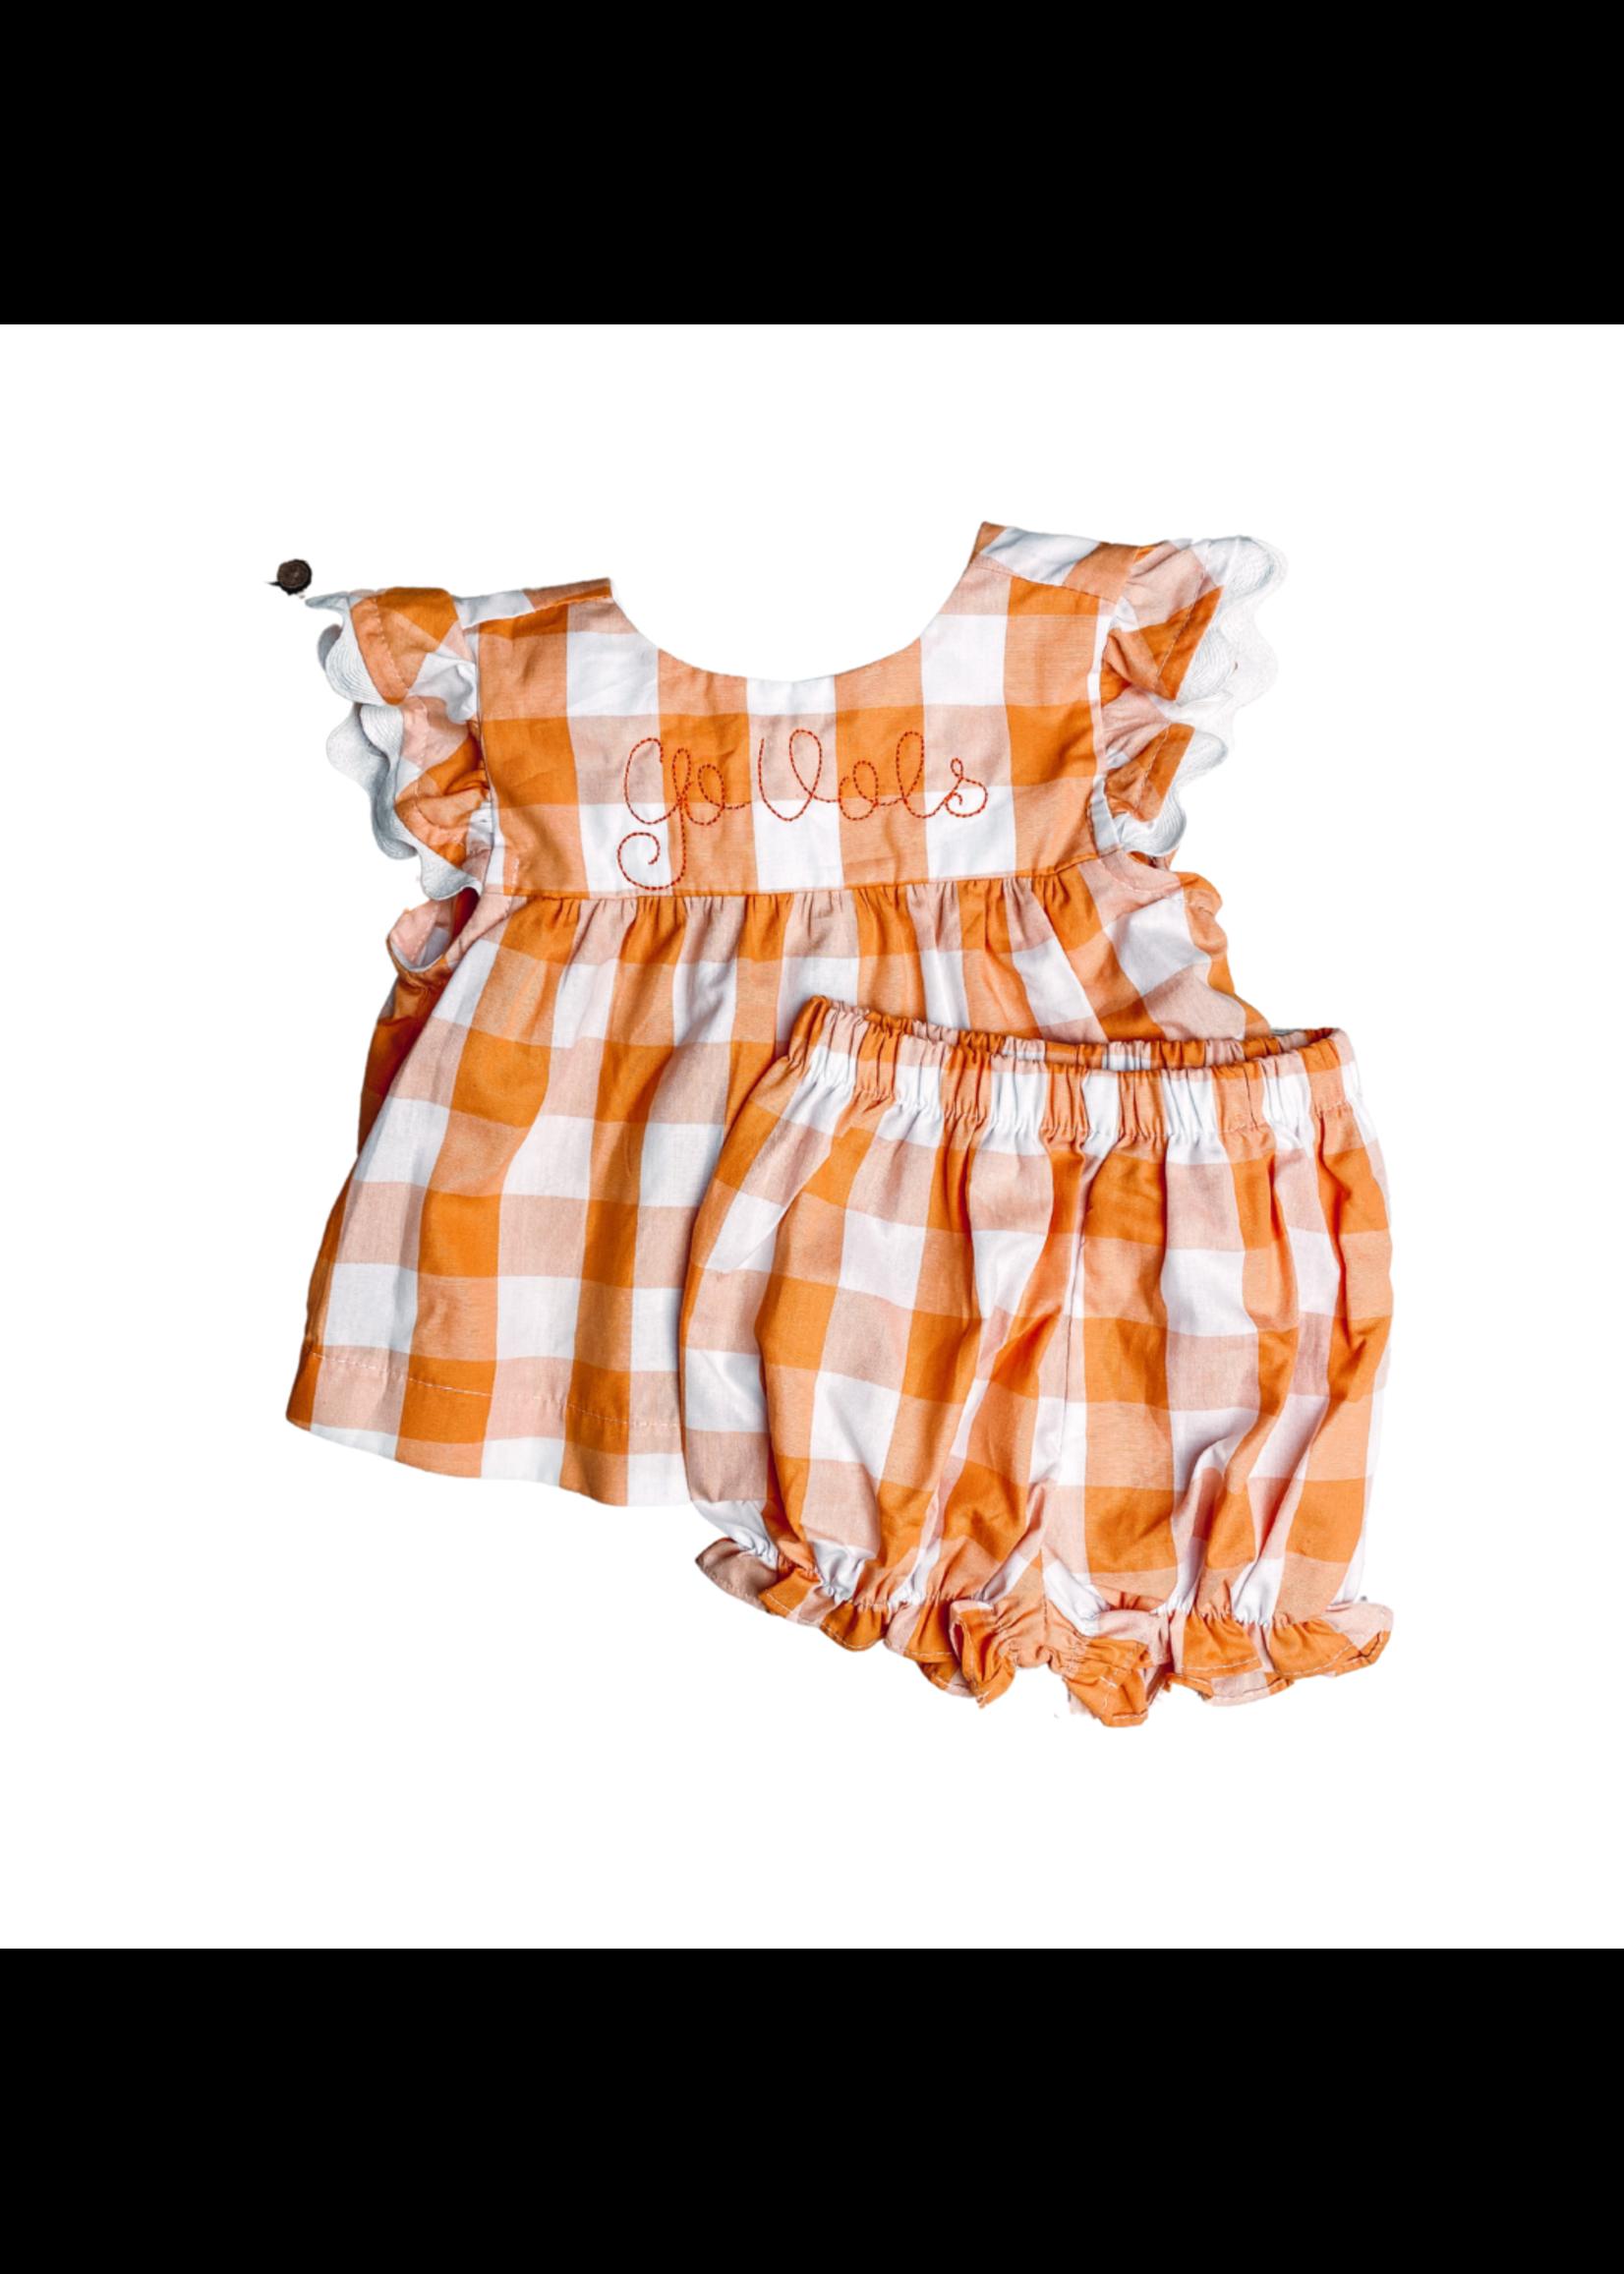 james and lottie Orange Mary Banded Short Set